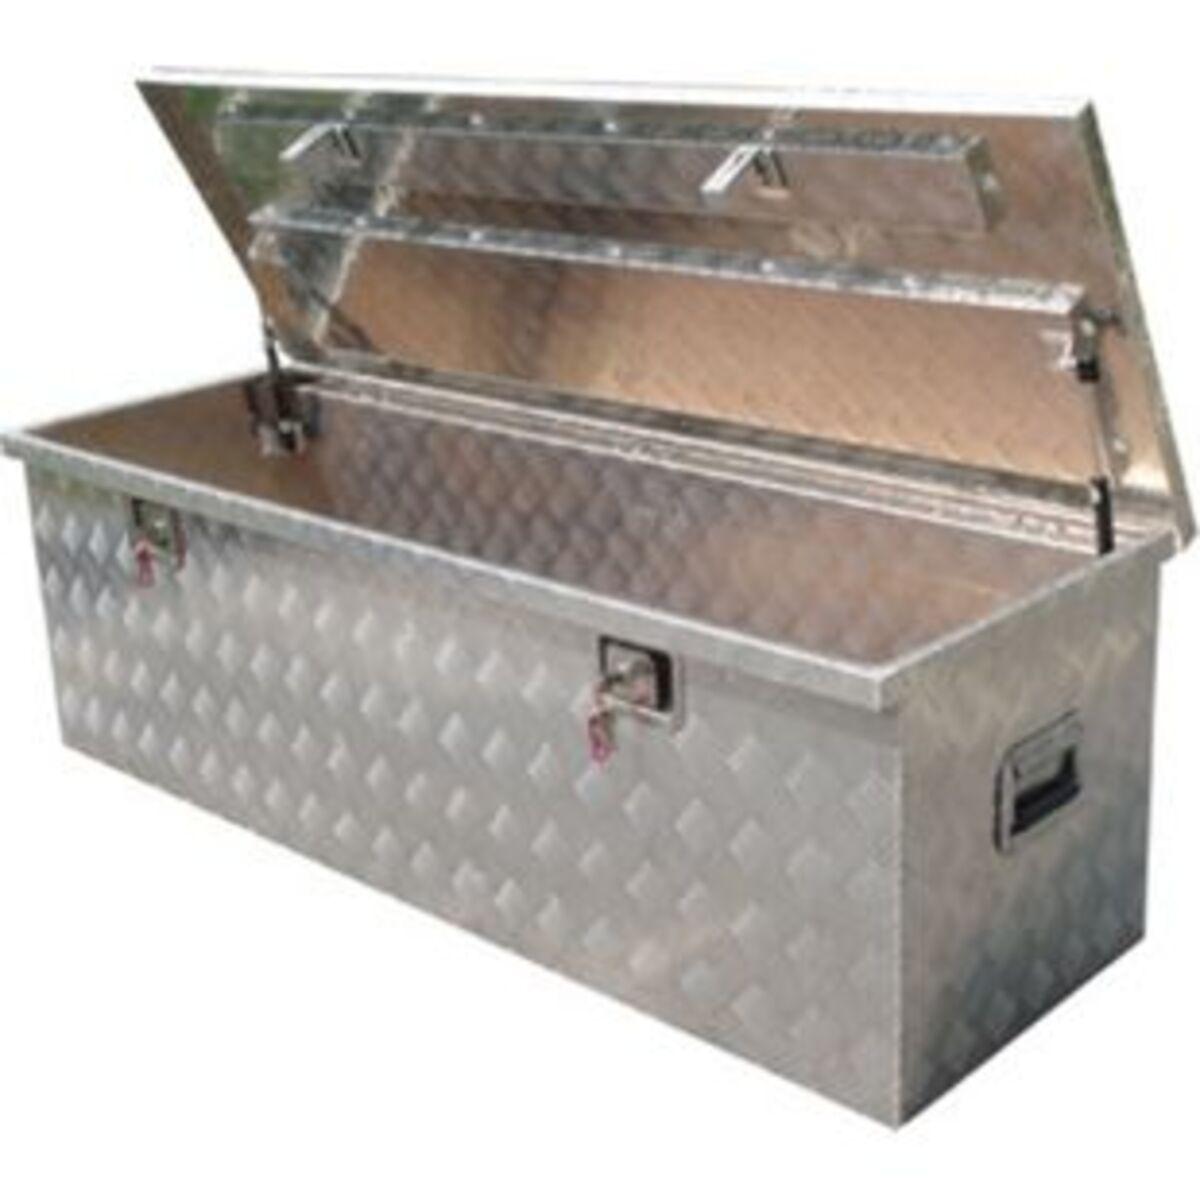 Bild 2 von Vintec VT 310 Alu-Transportbox